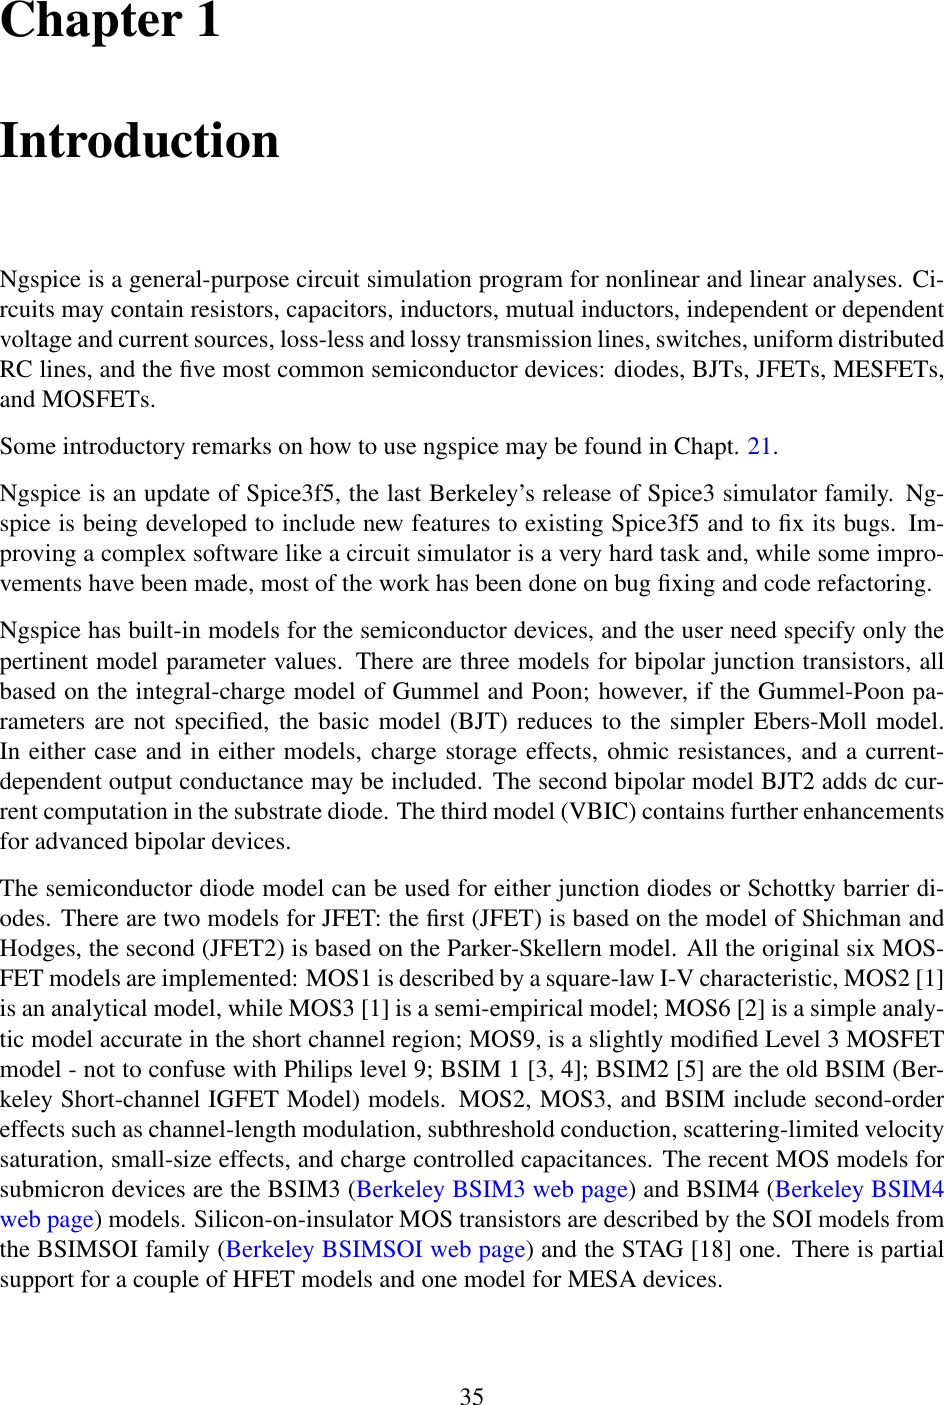 Ngspice User Manual V27